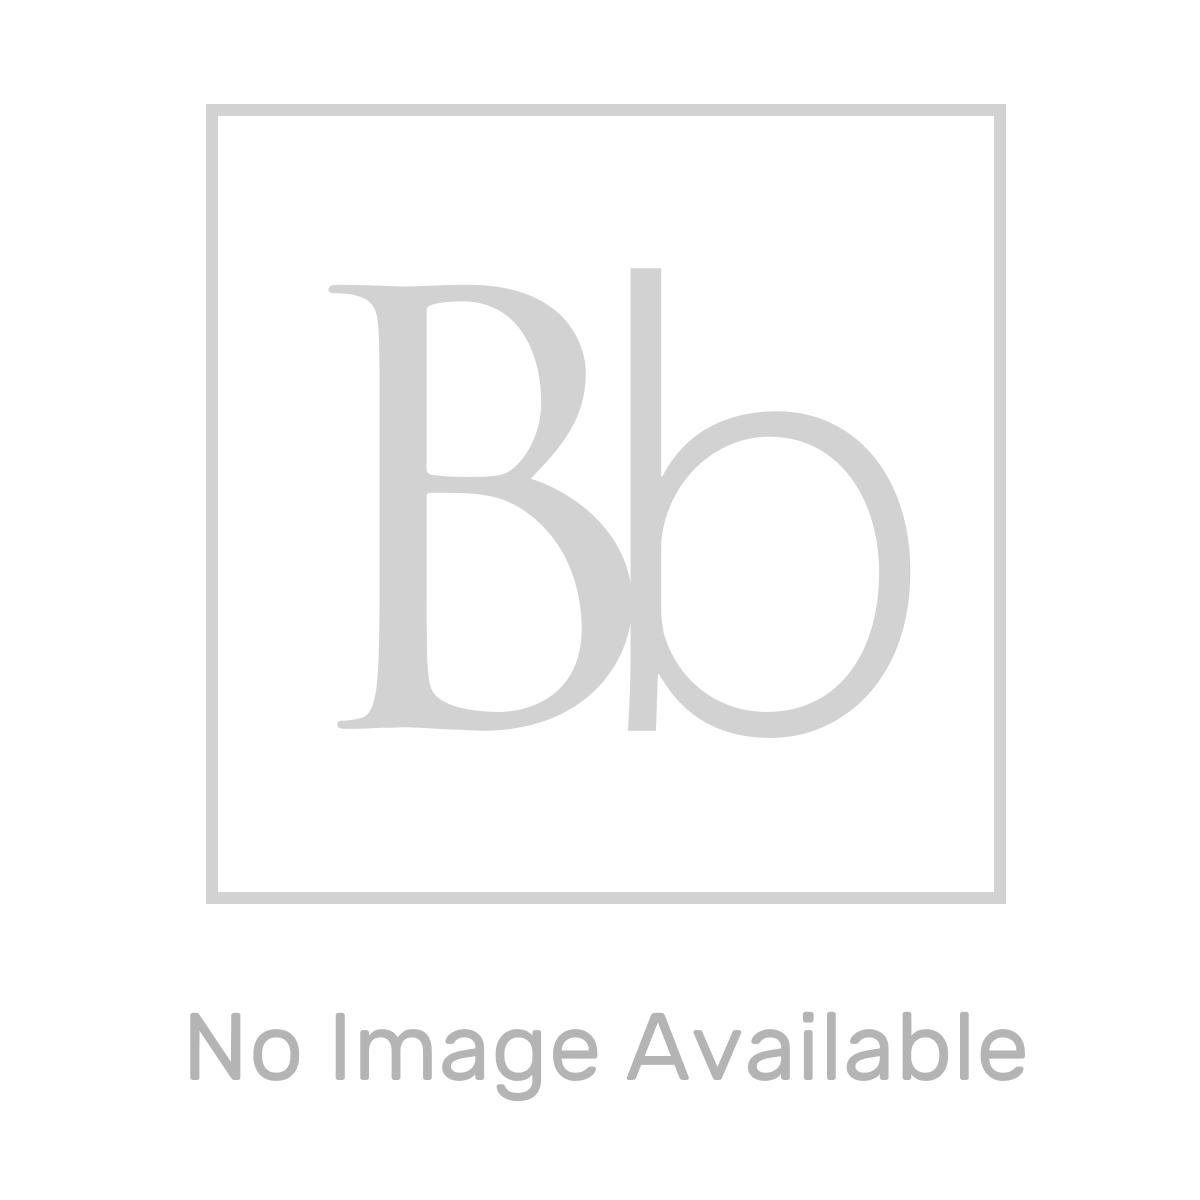 Nuie Athena Grey Avola 2 Drawer Floor Standing Vanity Unit with 40mm Profile Basin 600mm